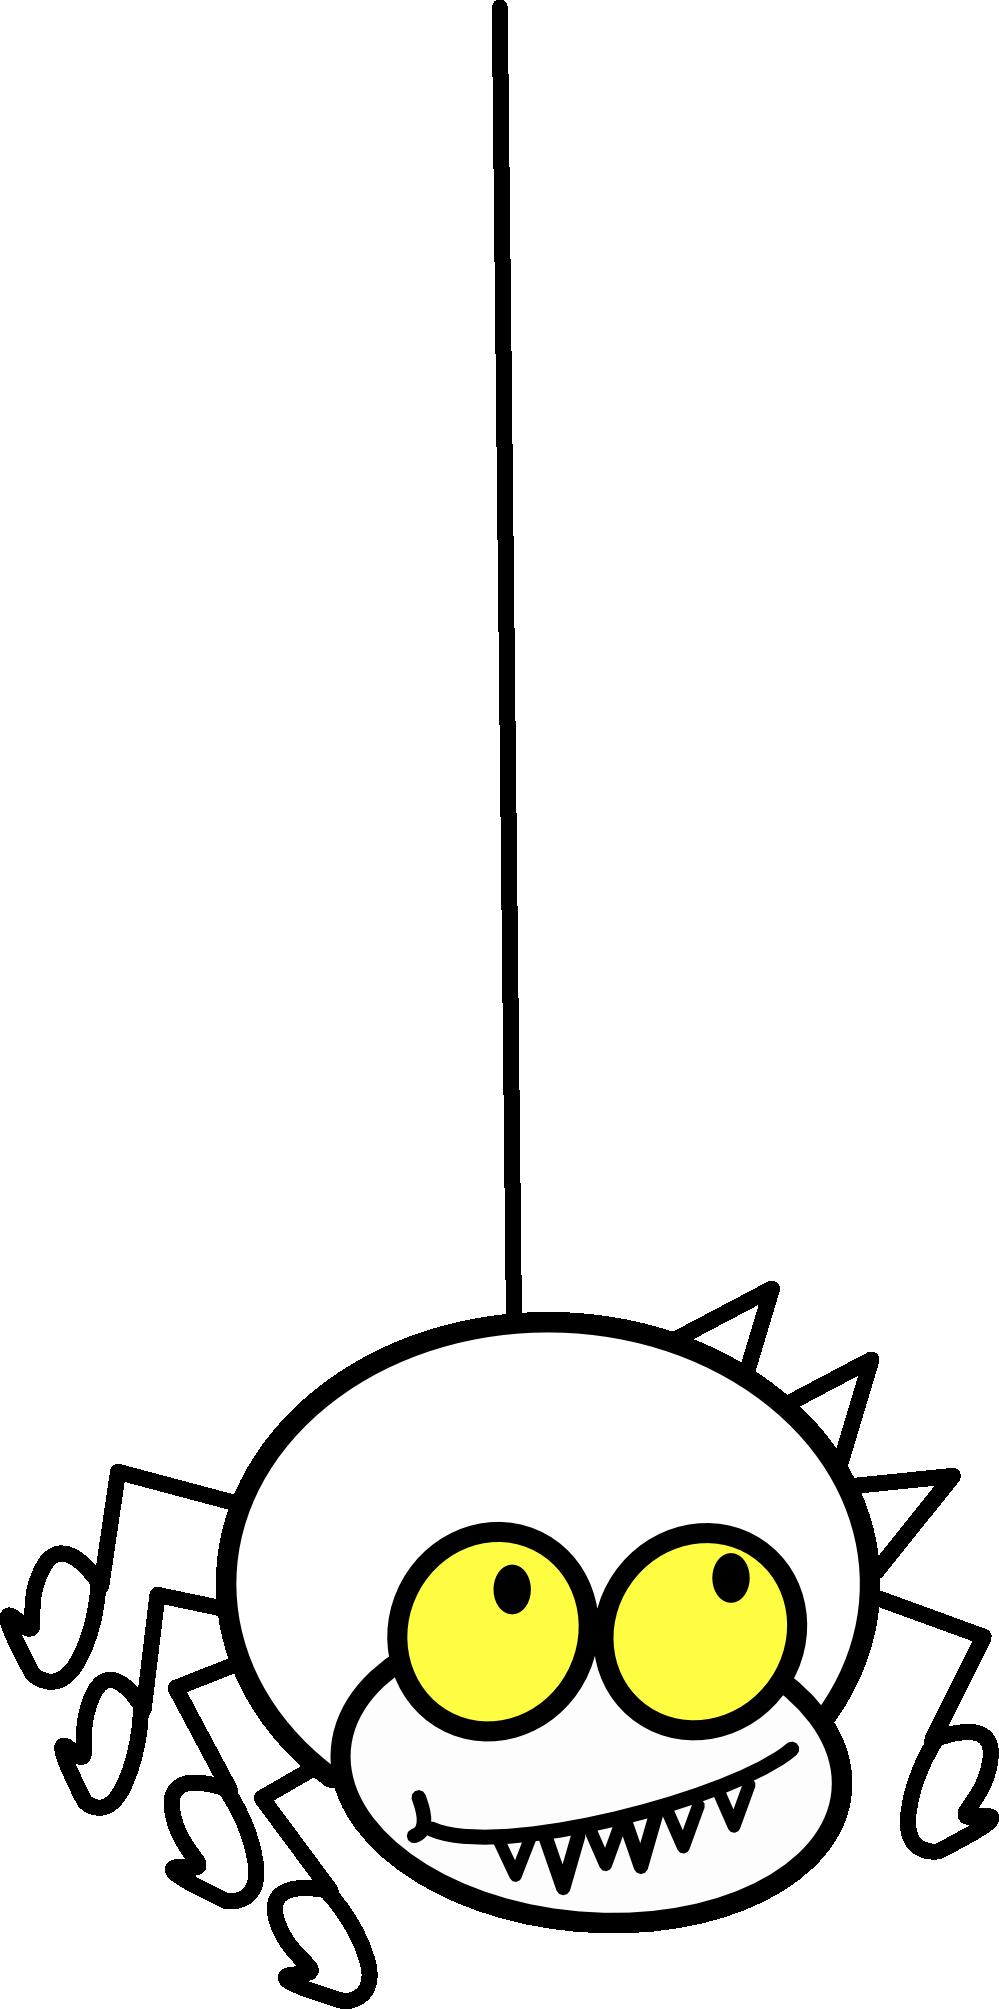 jpg black and white stock Itsy Bitsy Spider Clipart